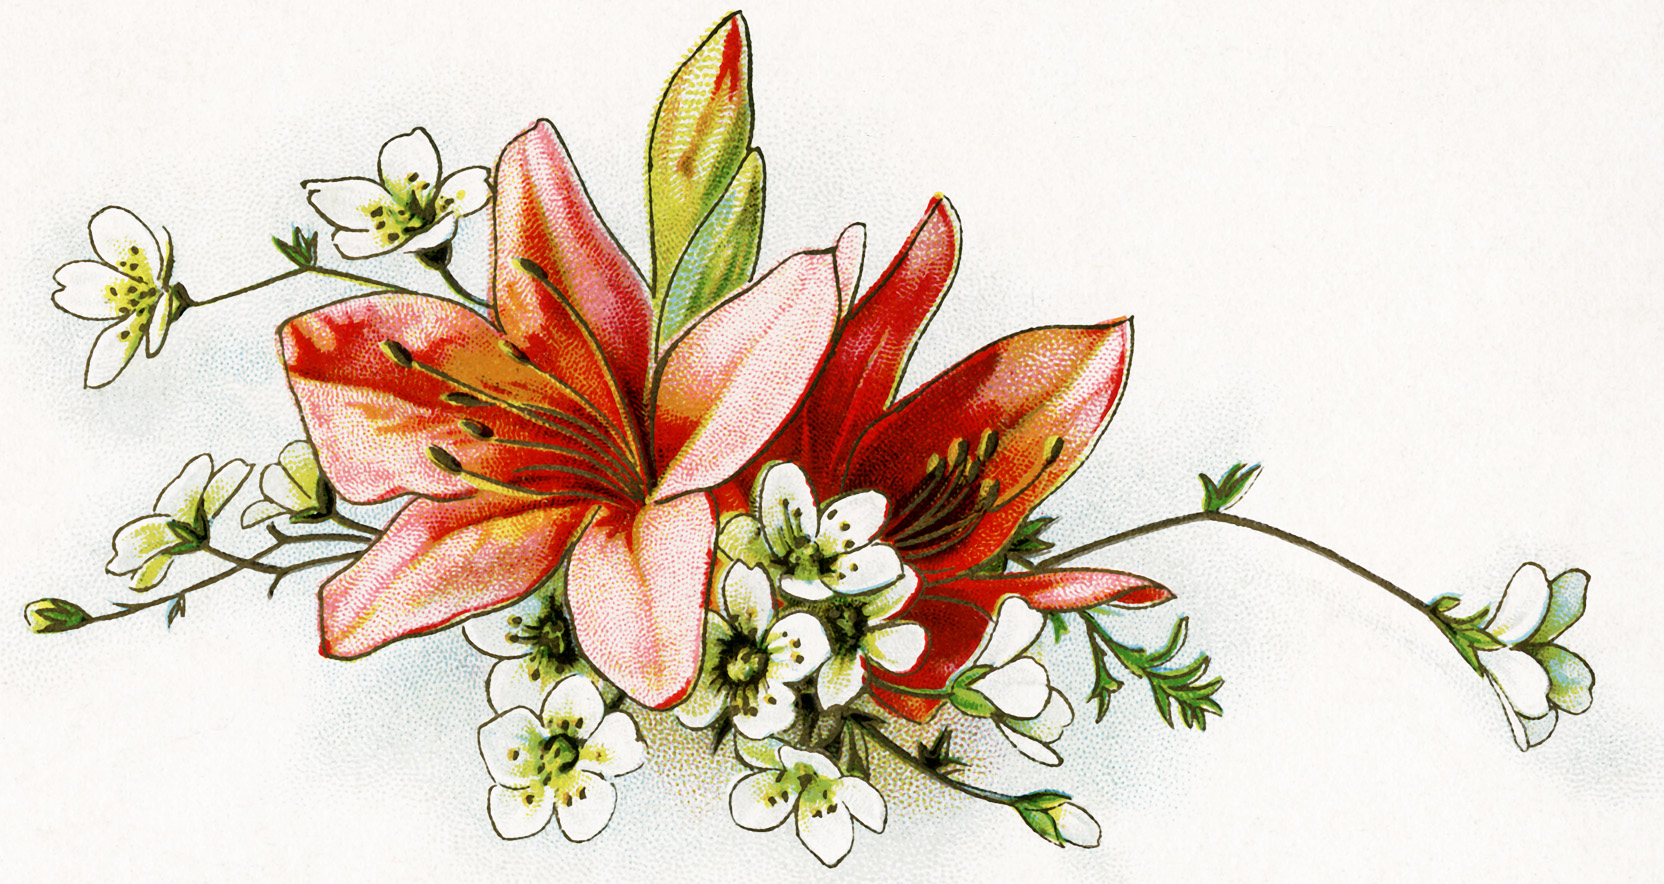 Vintage lily clipart clipart library download Free Vintage Floral Image ~ Lilies - Old Design Shop Blog clipart library download